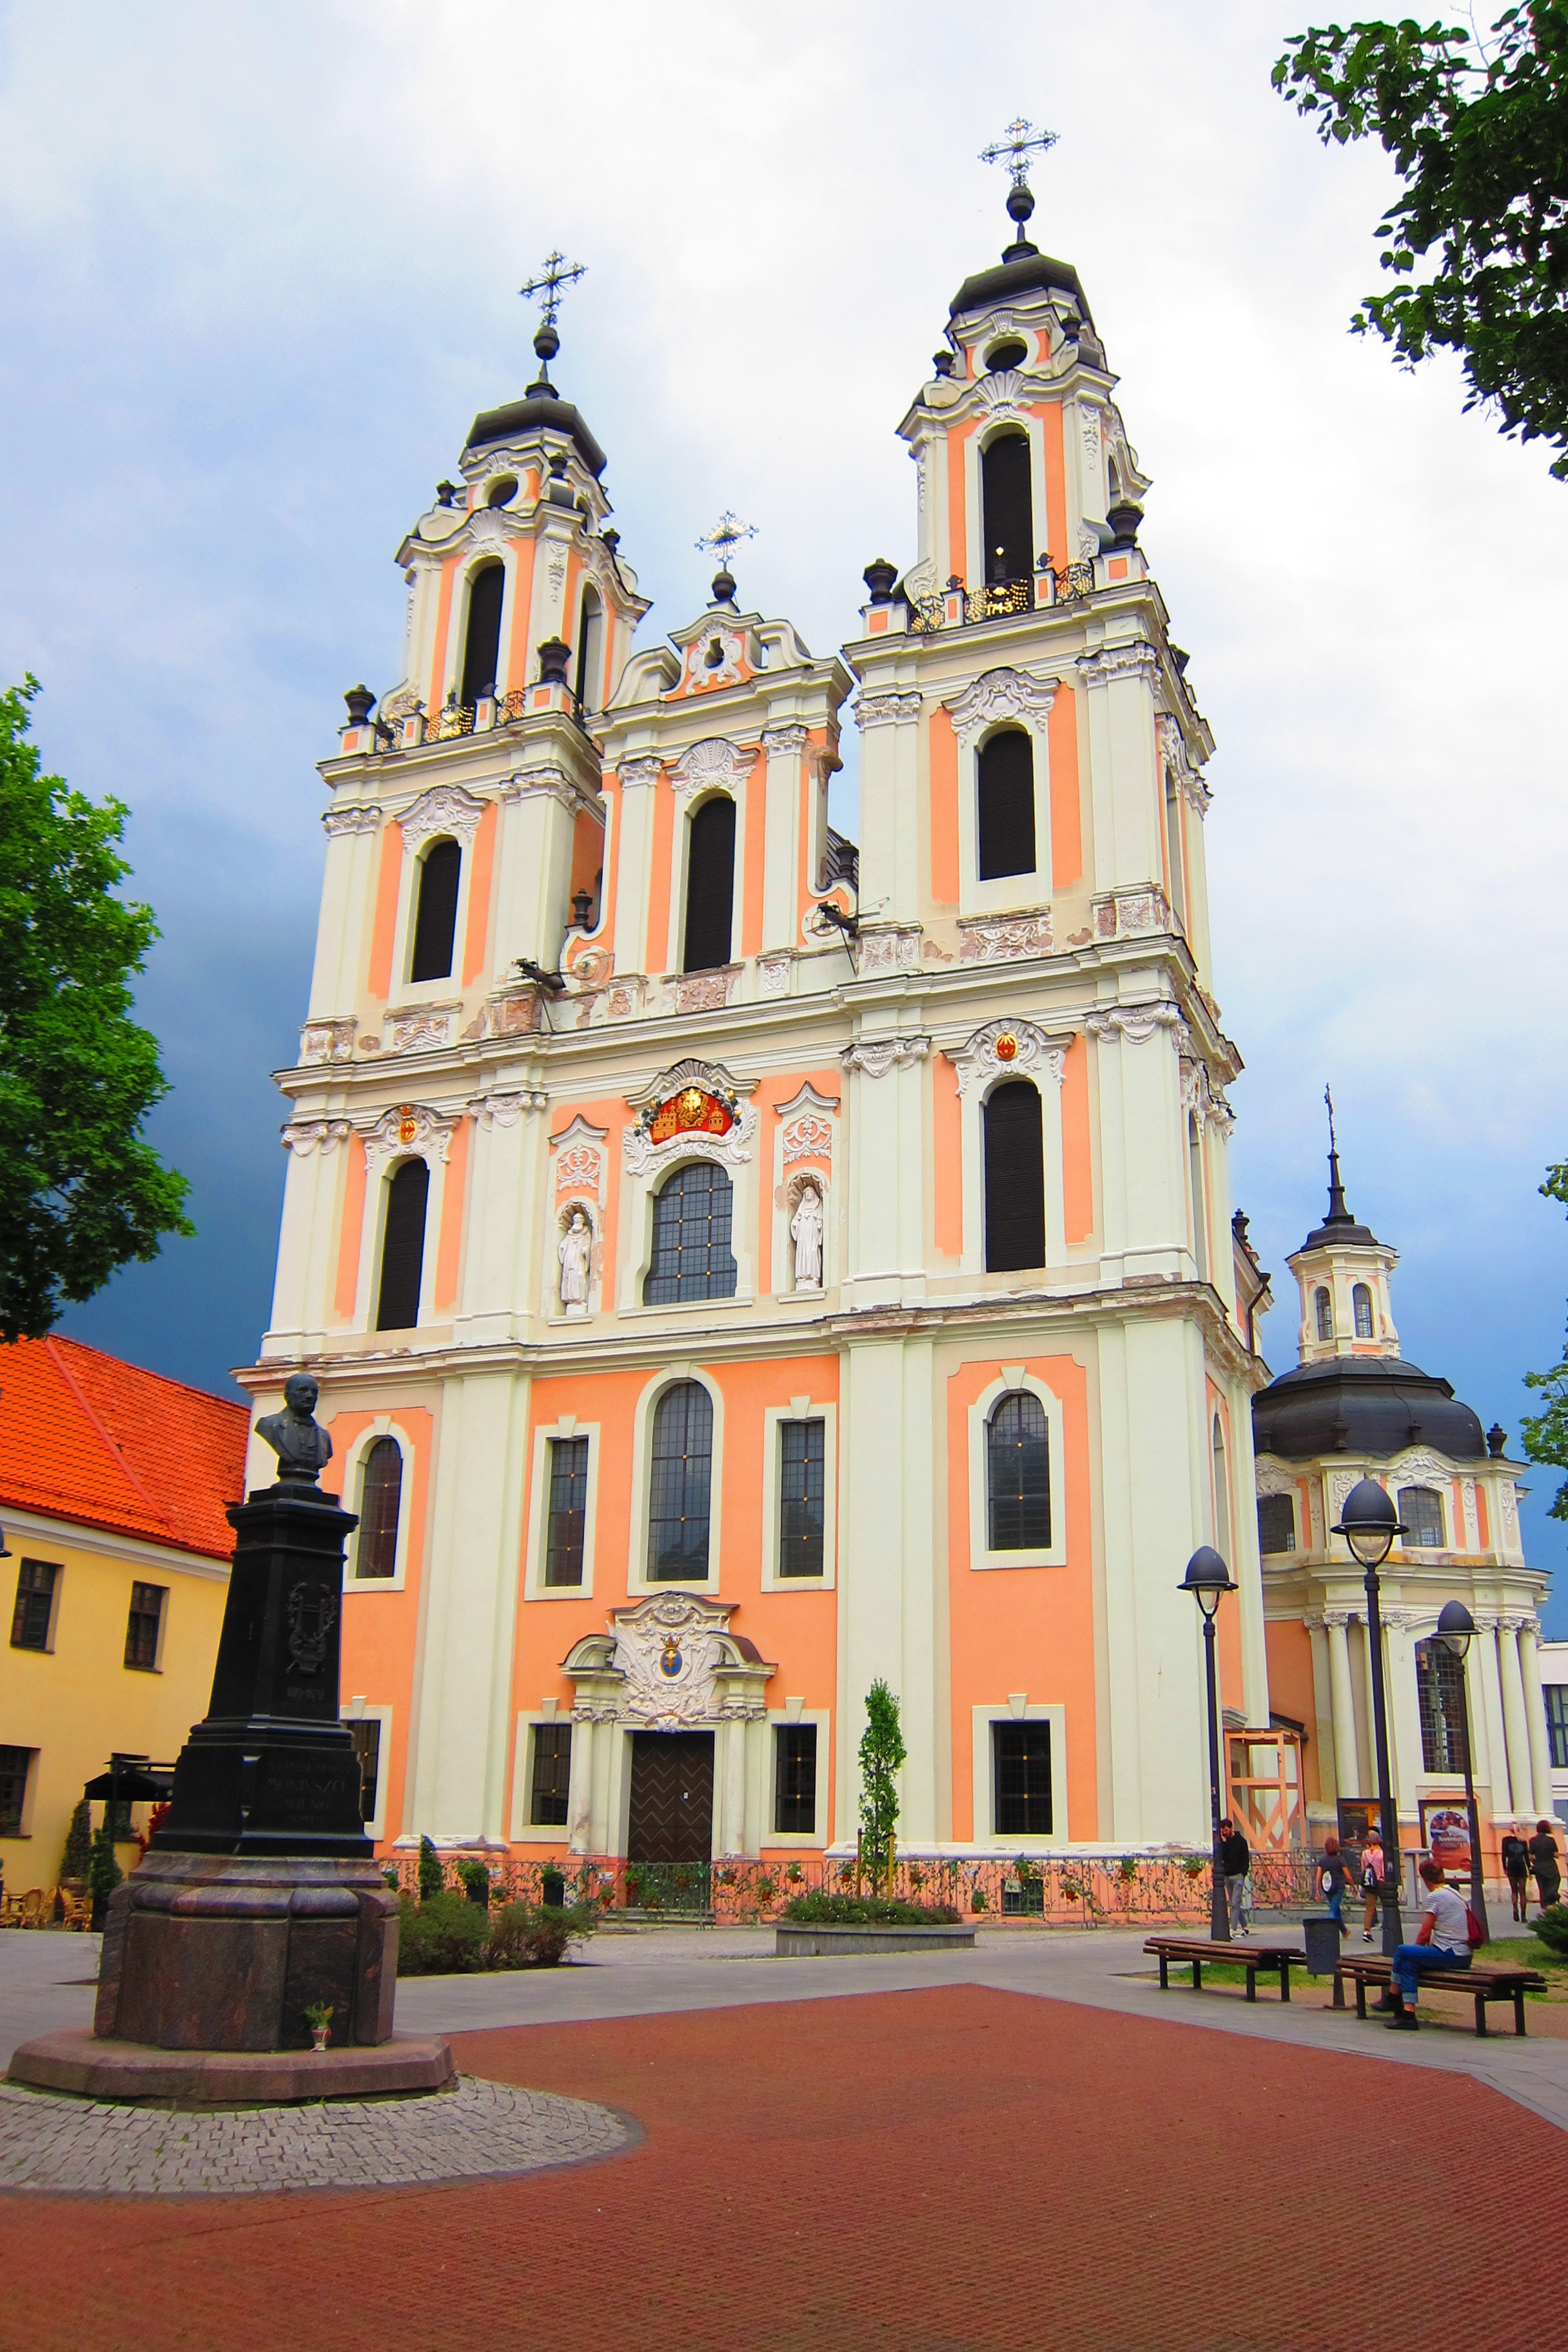 Vilnius, Lithuania, 5/23/19